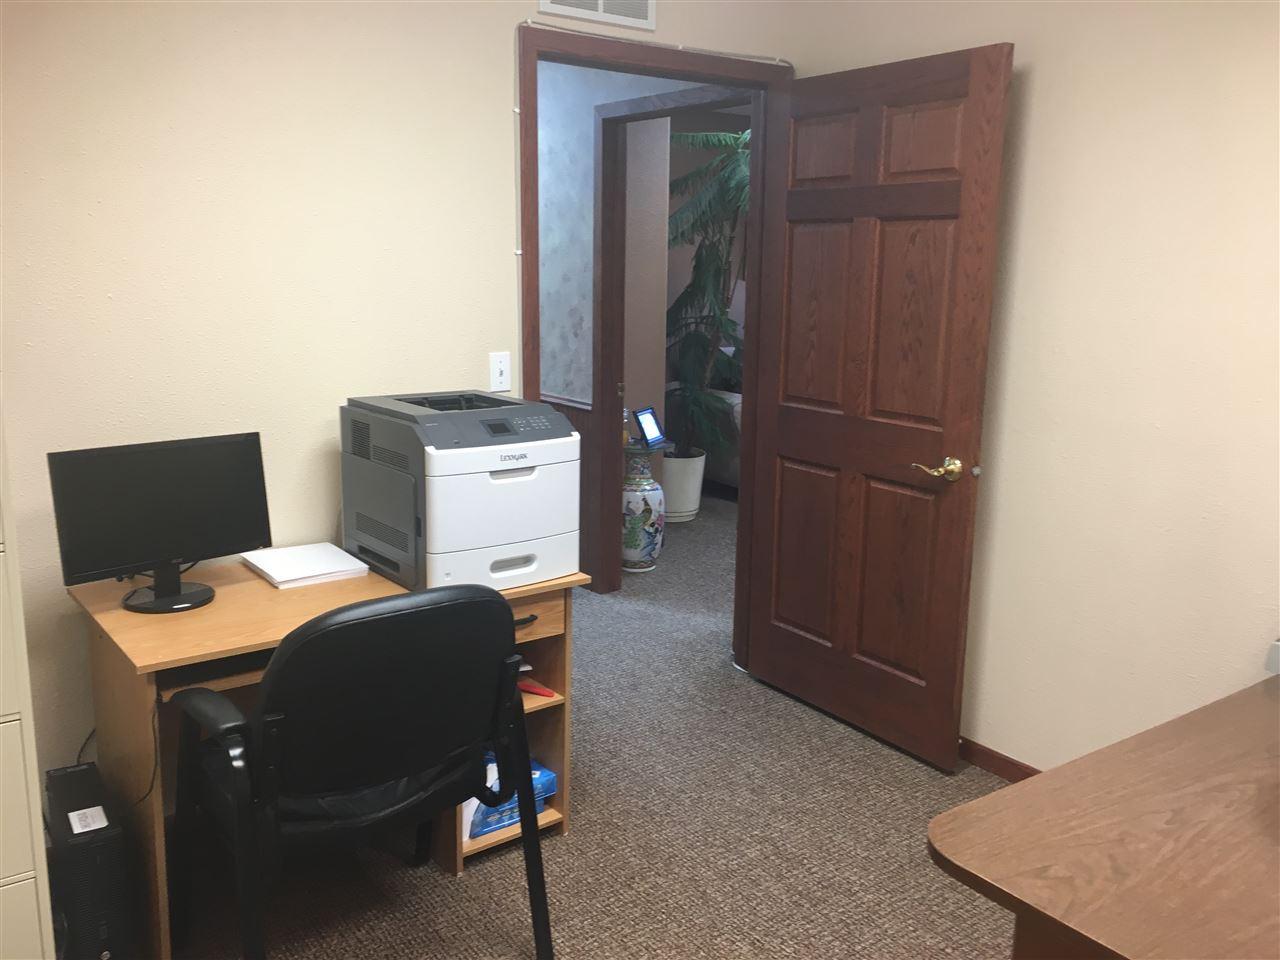 125 E Colorado Blvd. Suite 2C